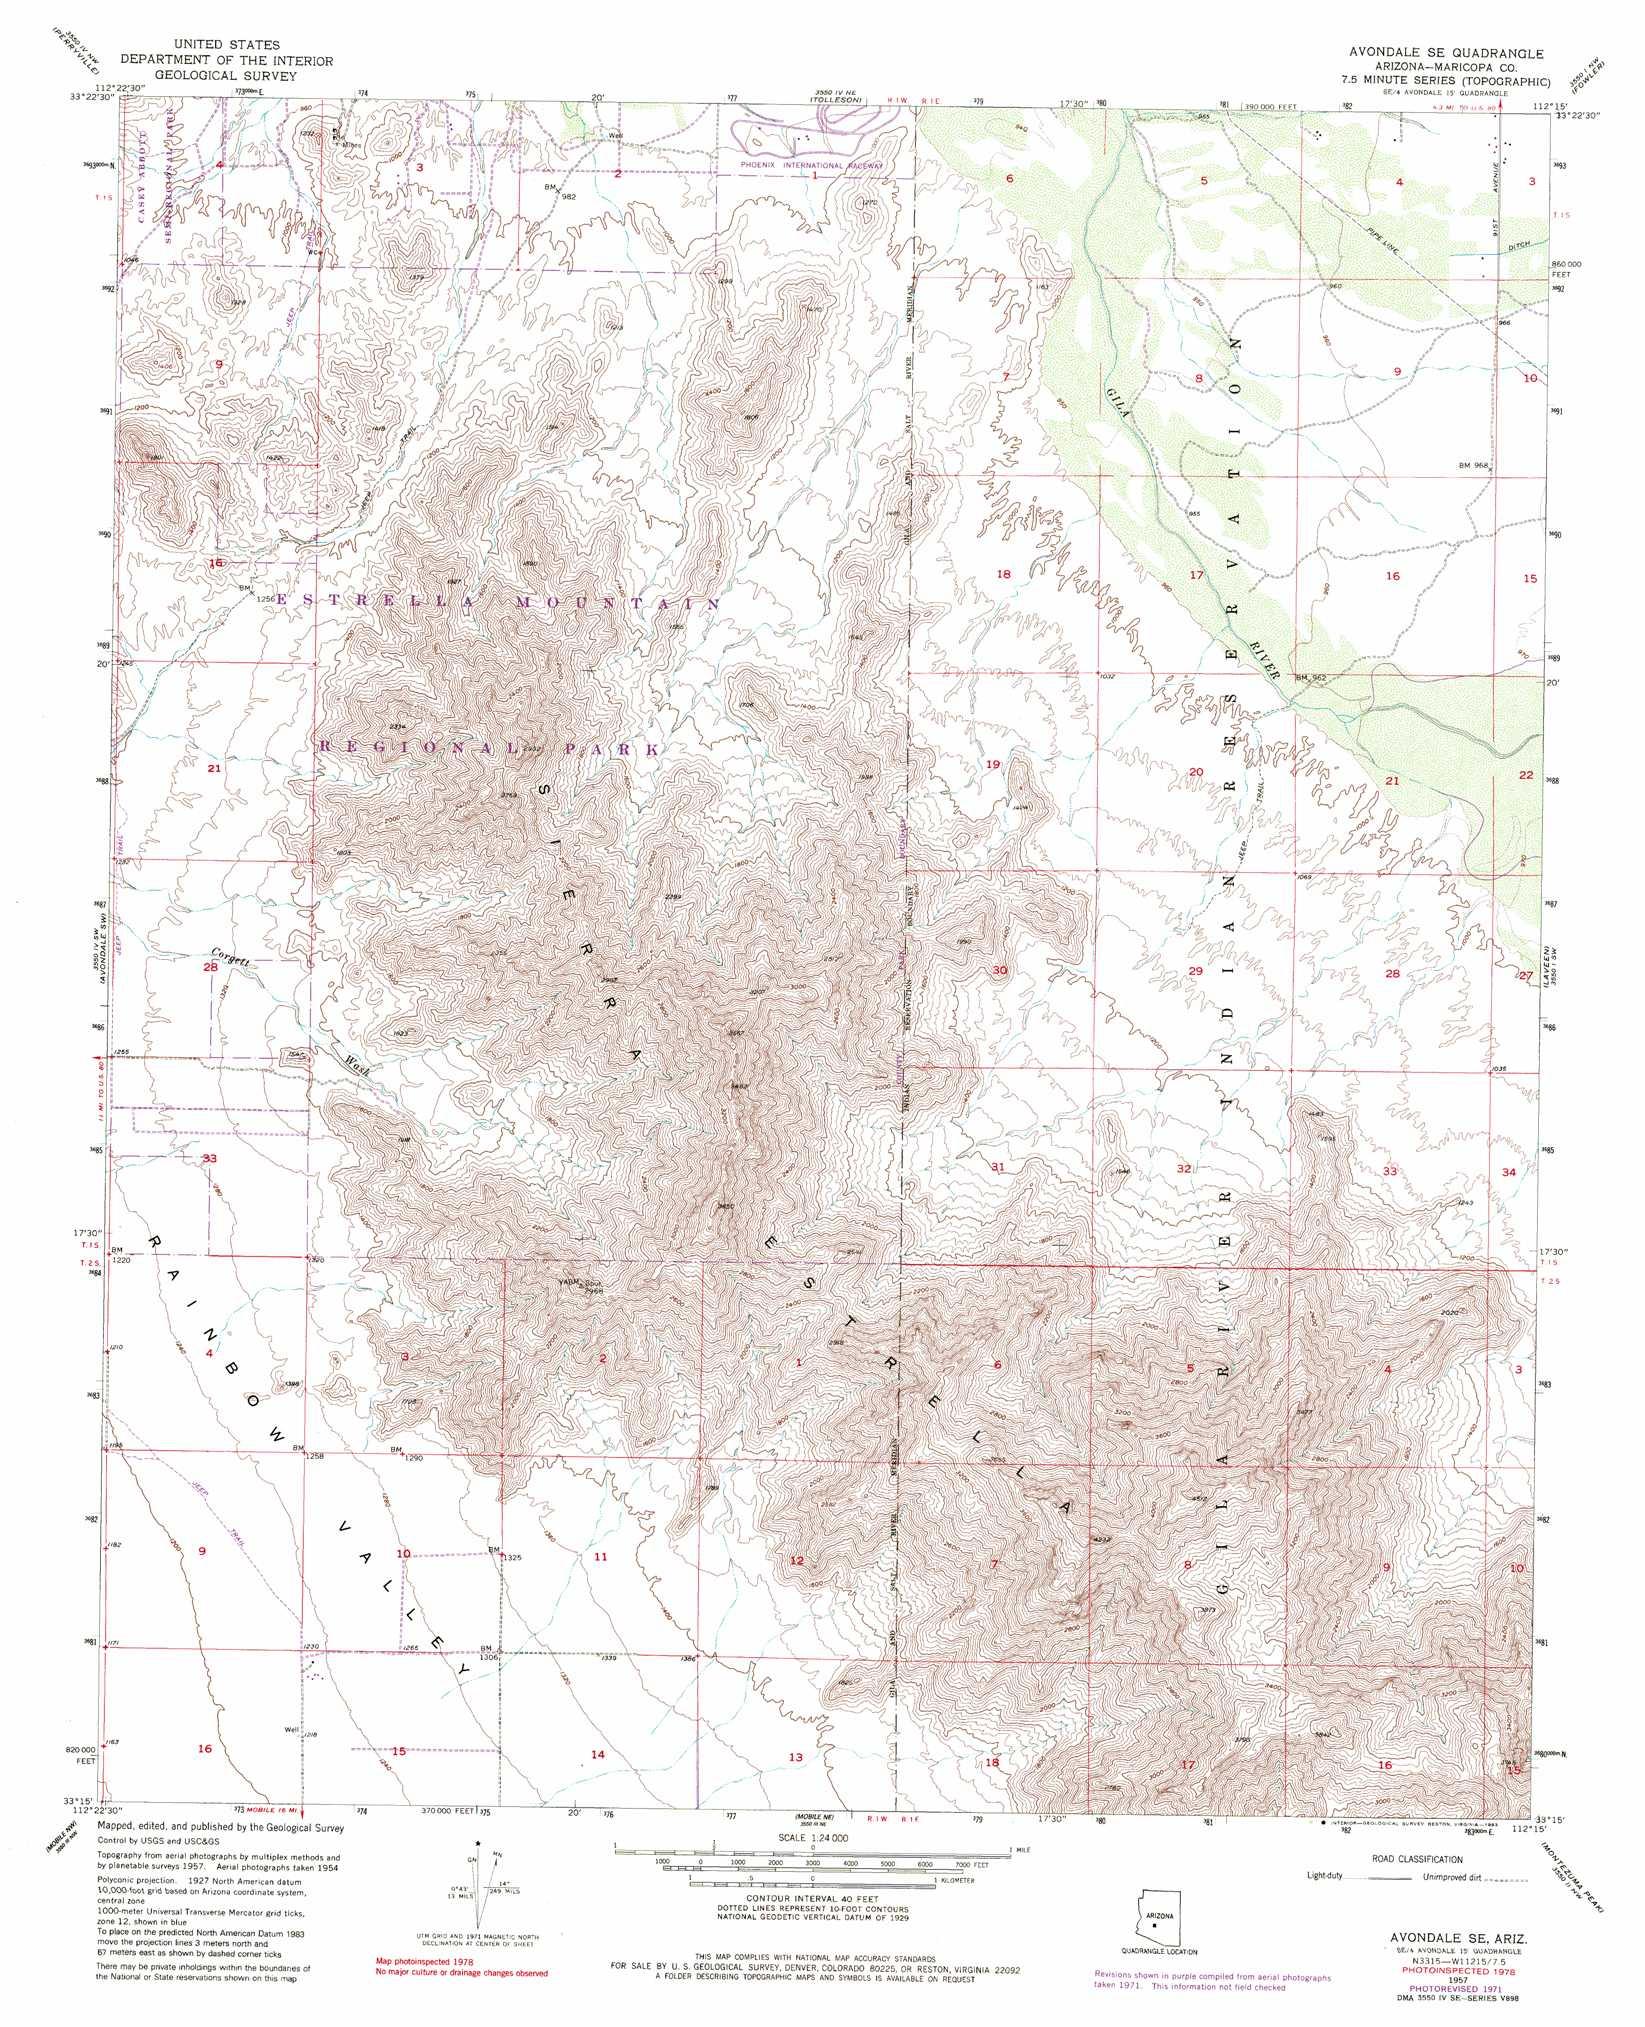 Avondale Se topographic map AZ USGS Topo Quad 33112c3